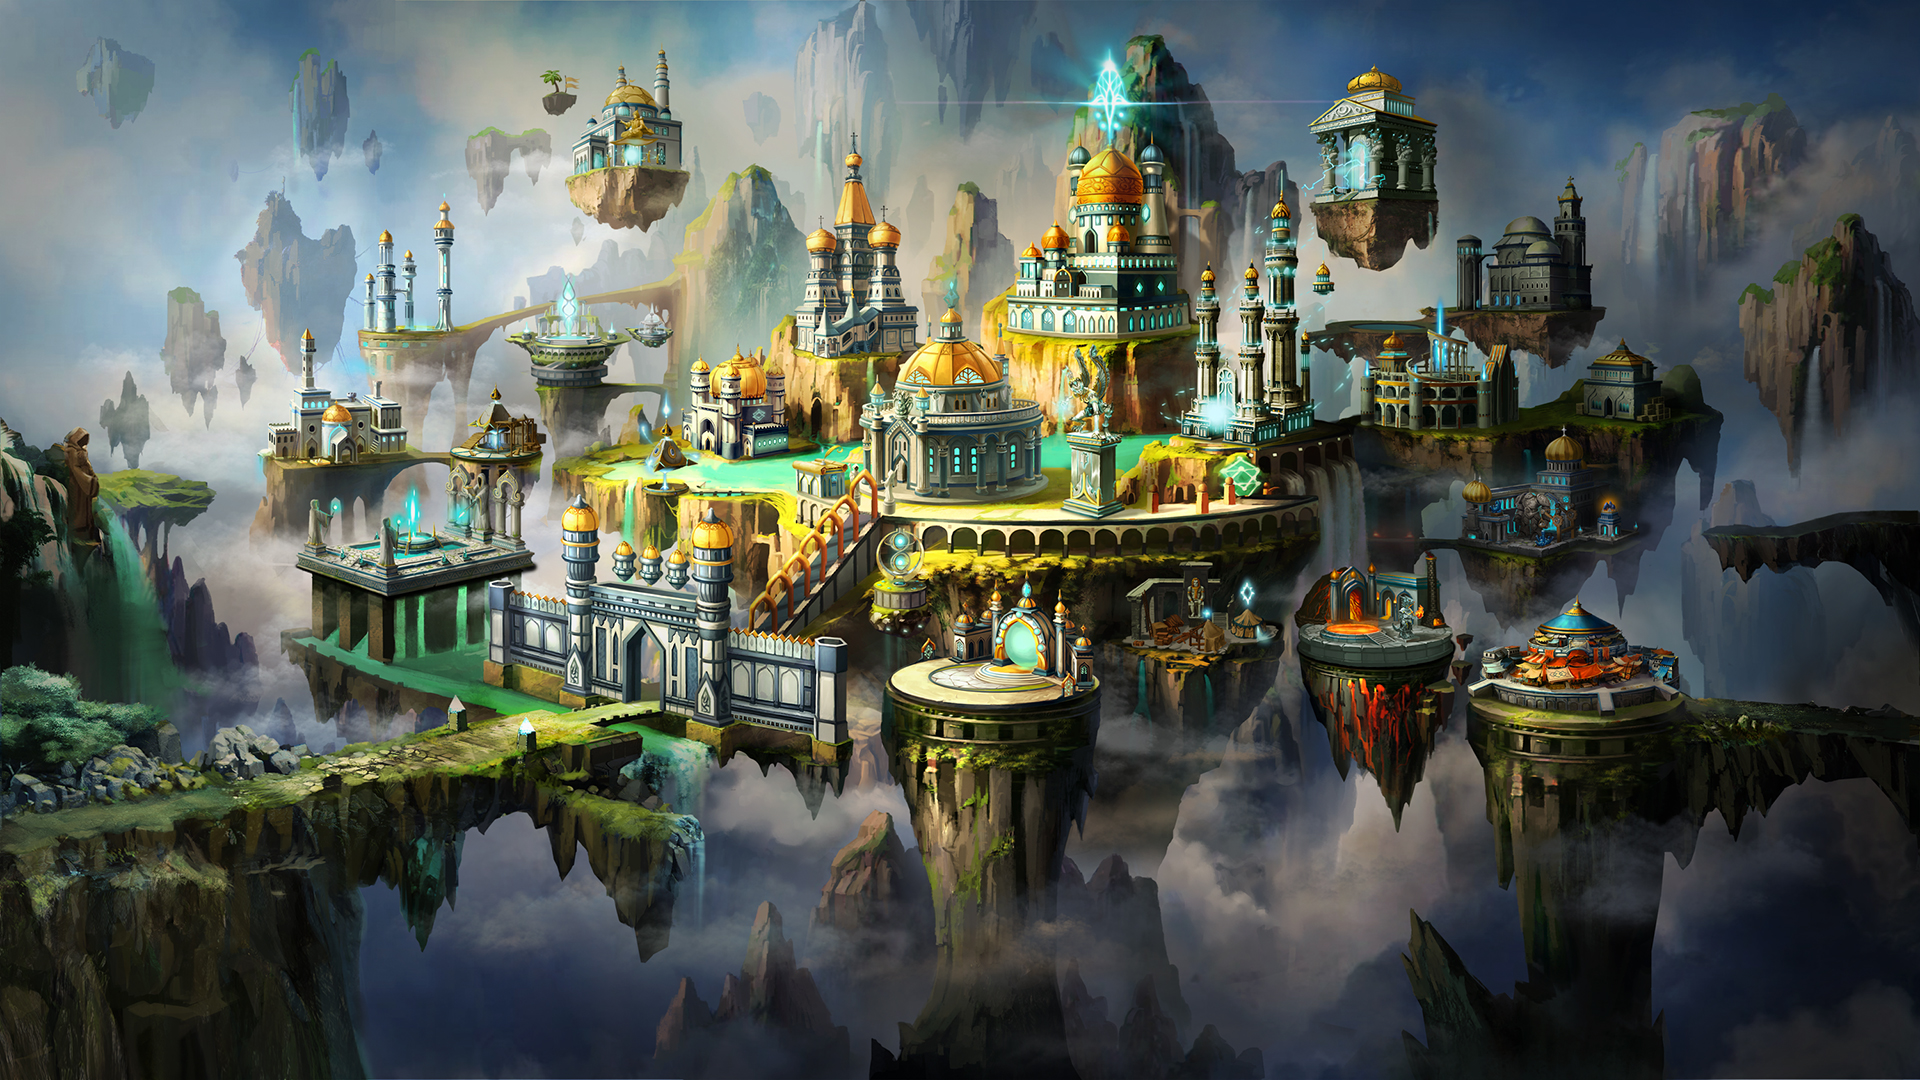 Preview Might and Magic Heroes VII - Návrat do světa Ashan 9491